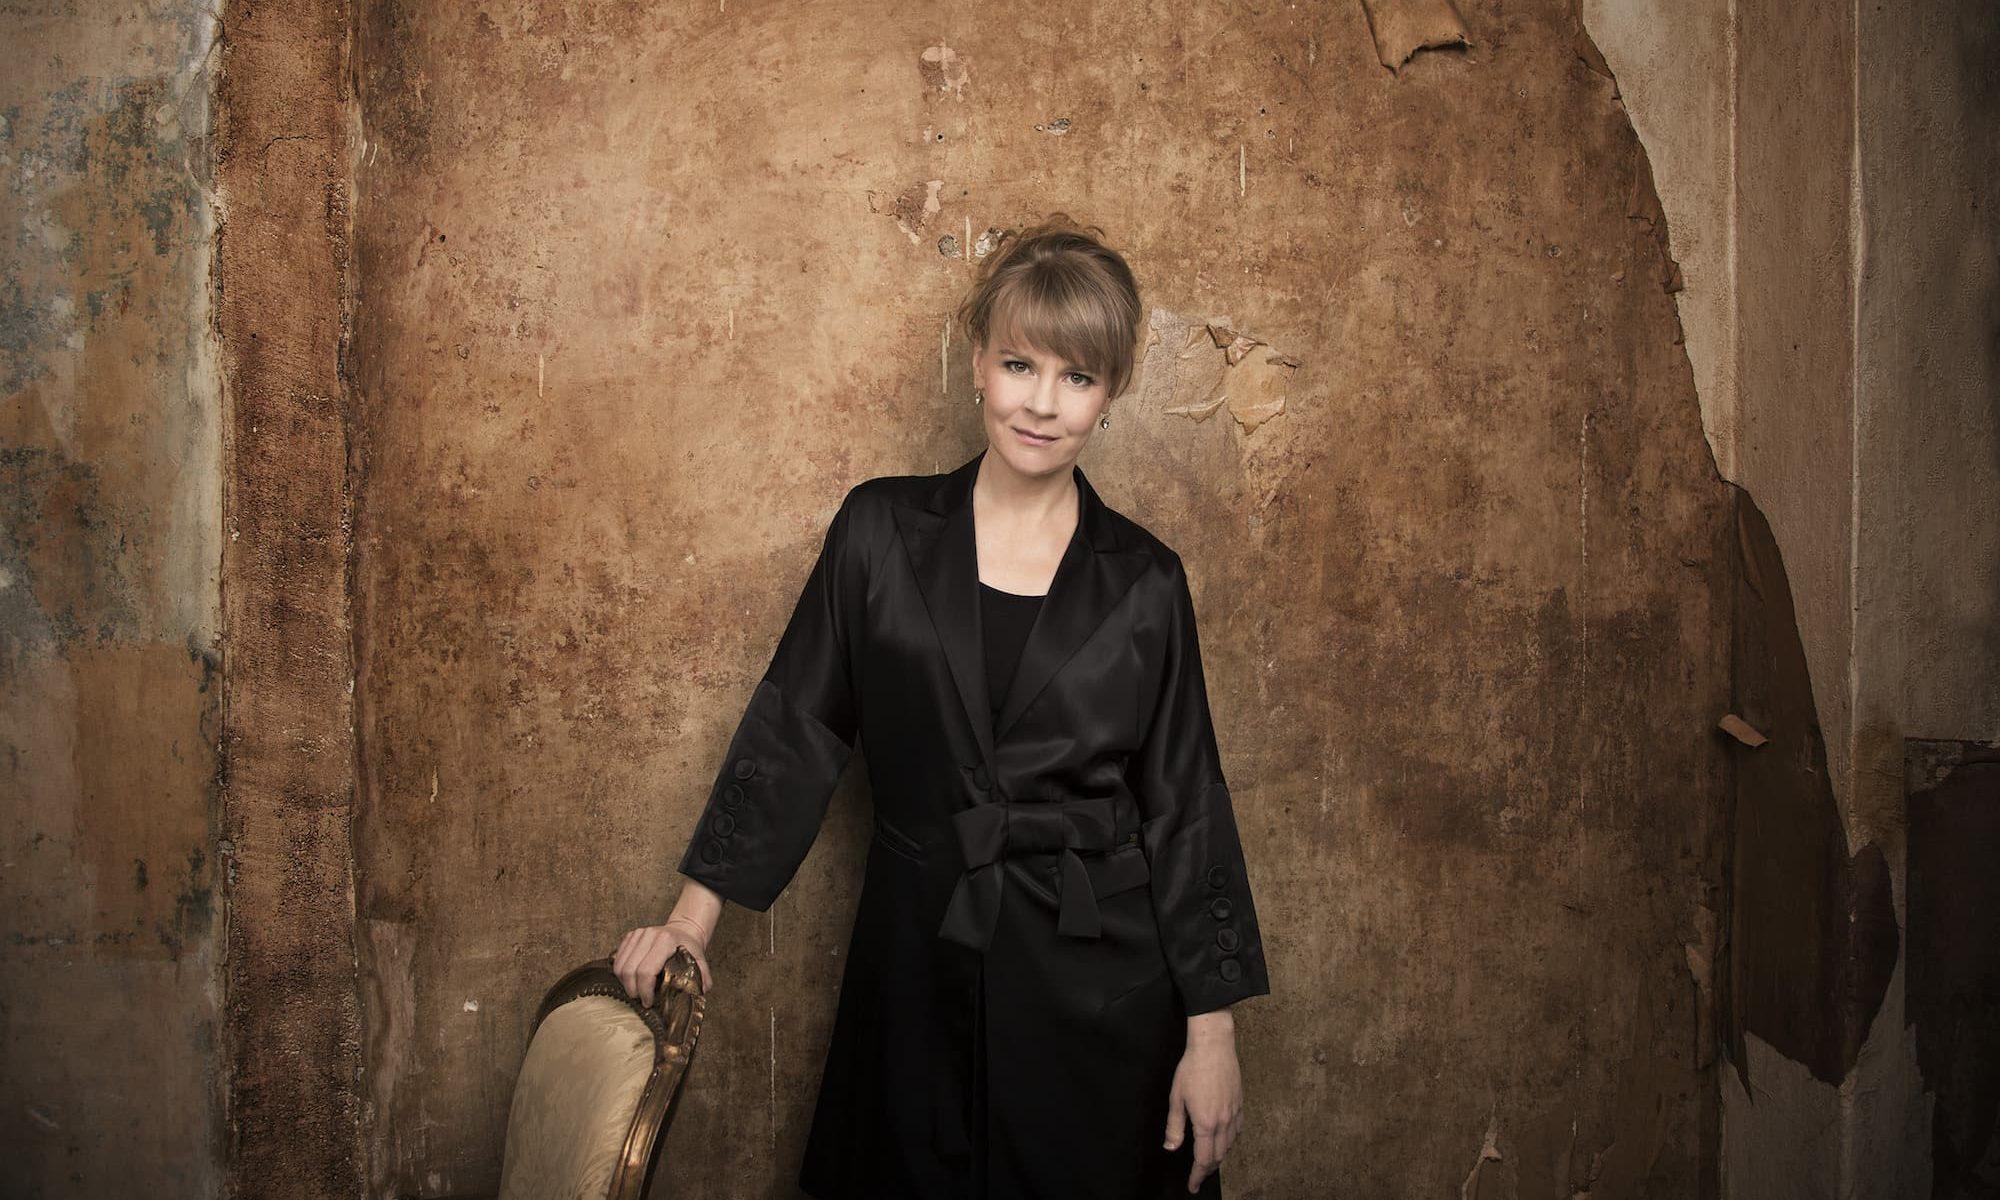 Susanna Mälkki (Photo: Simon Fowler)